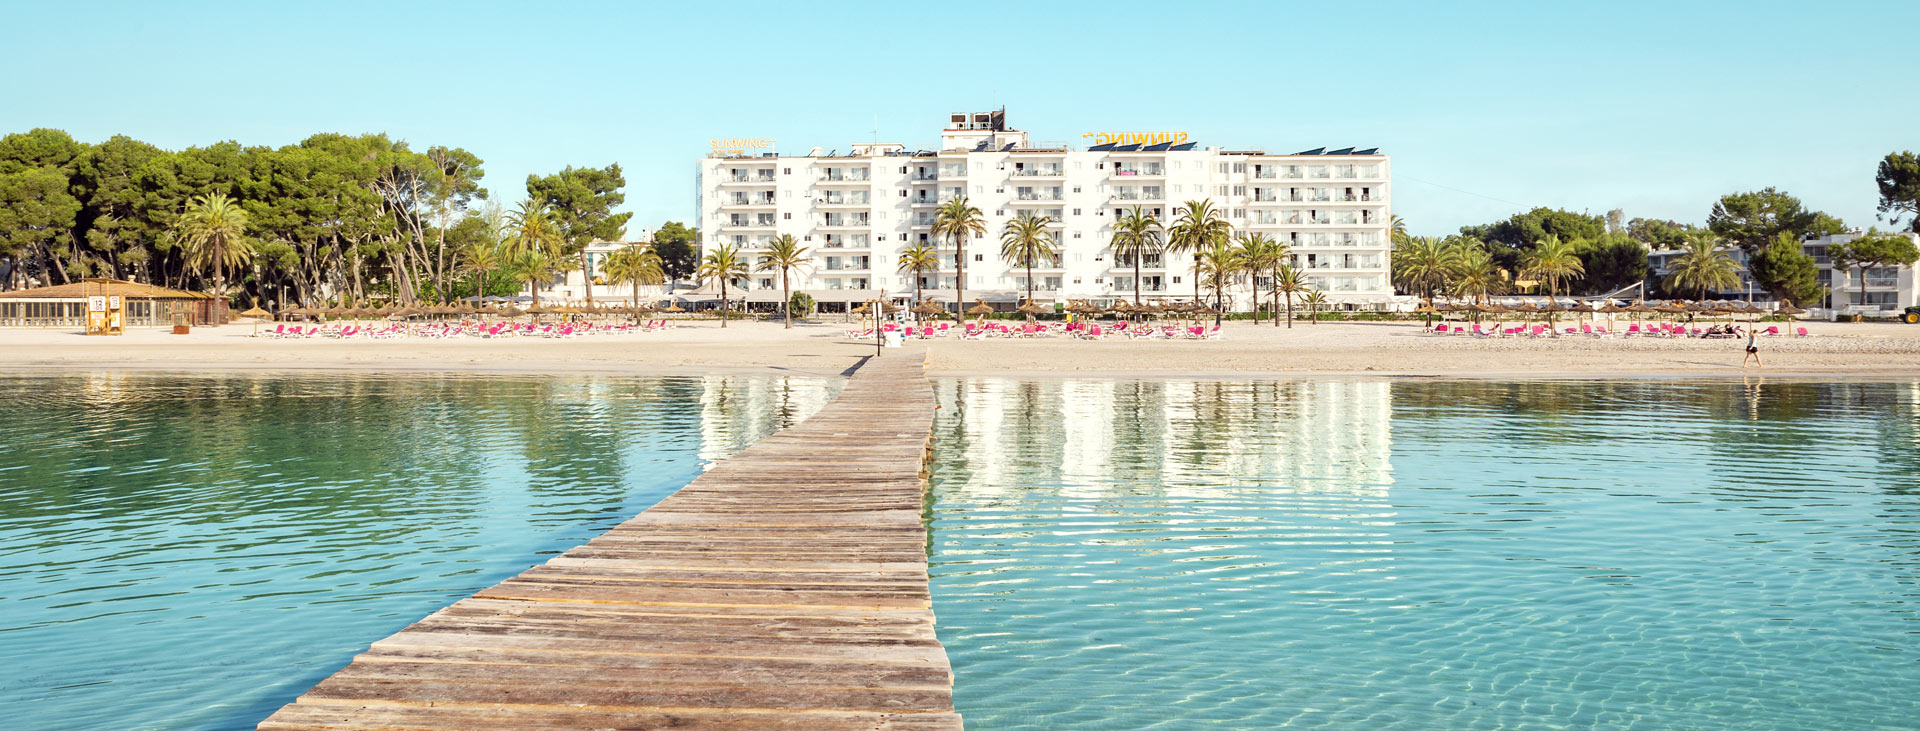 Sunwing Alcudia Beach, Alcudia, Mallorca, Spania